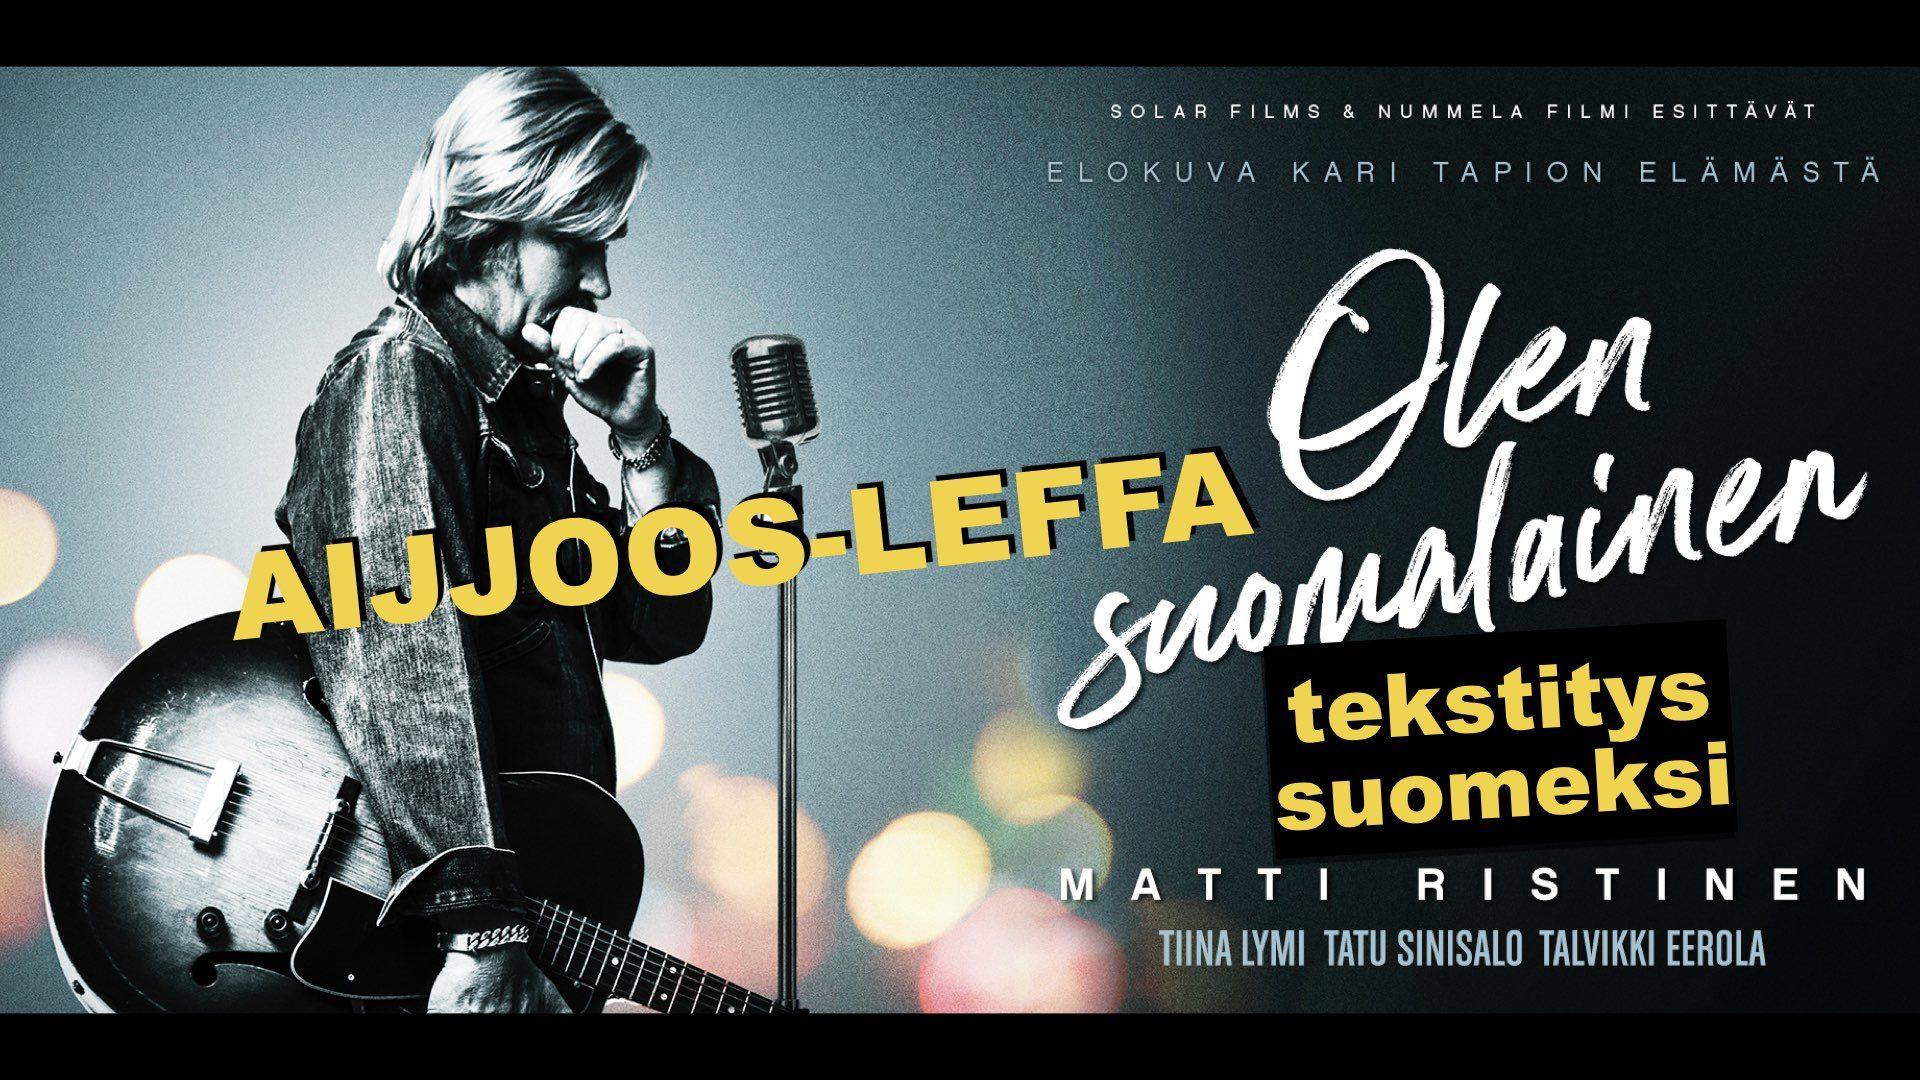 AIJJOOS-LEFFA: Olen suomalainen